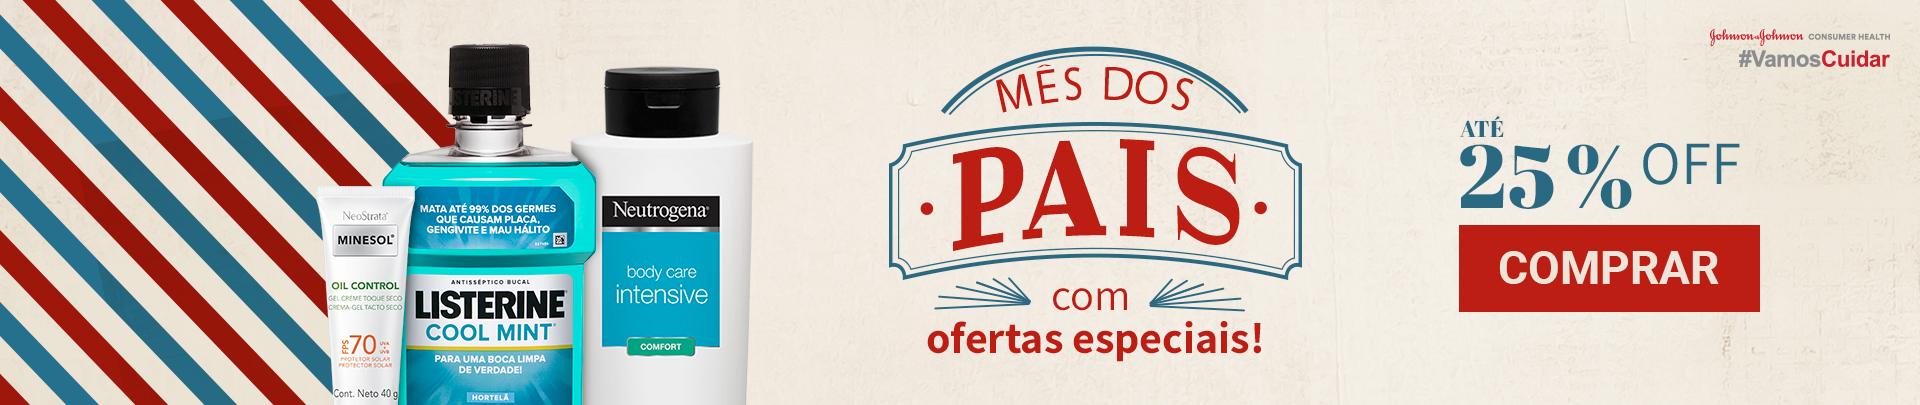 Mes_dos_Pais